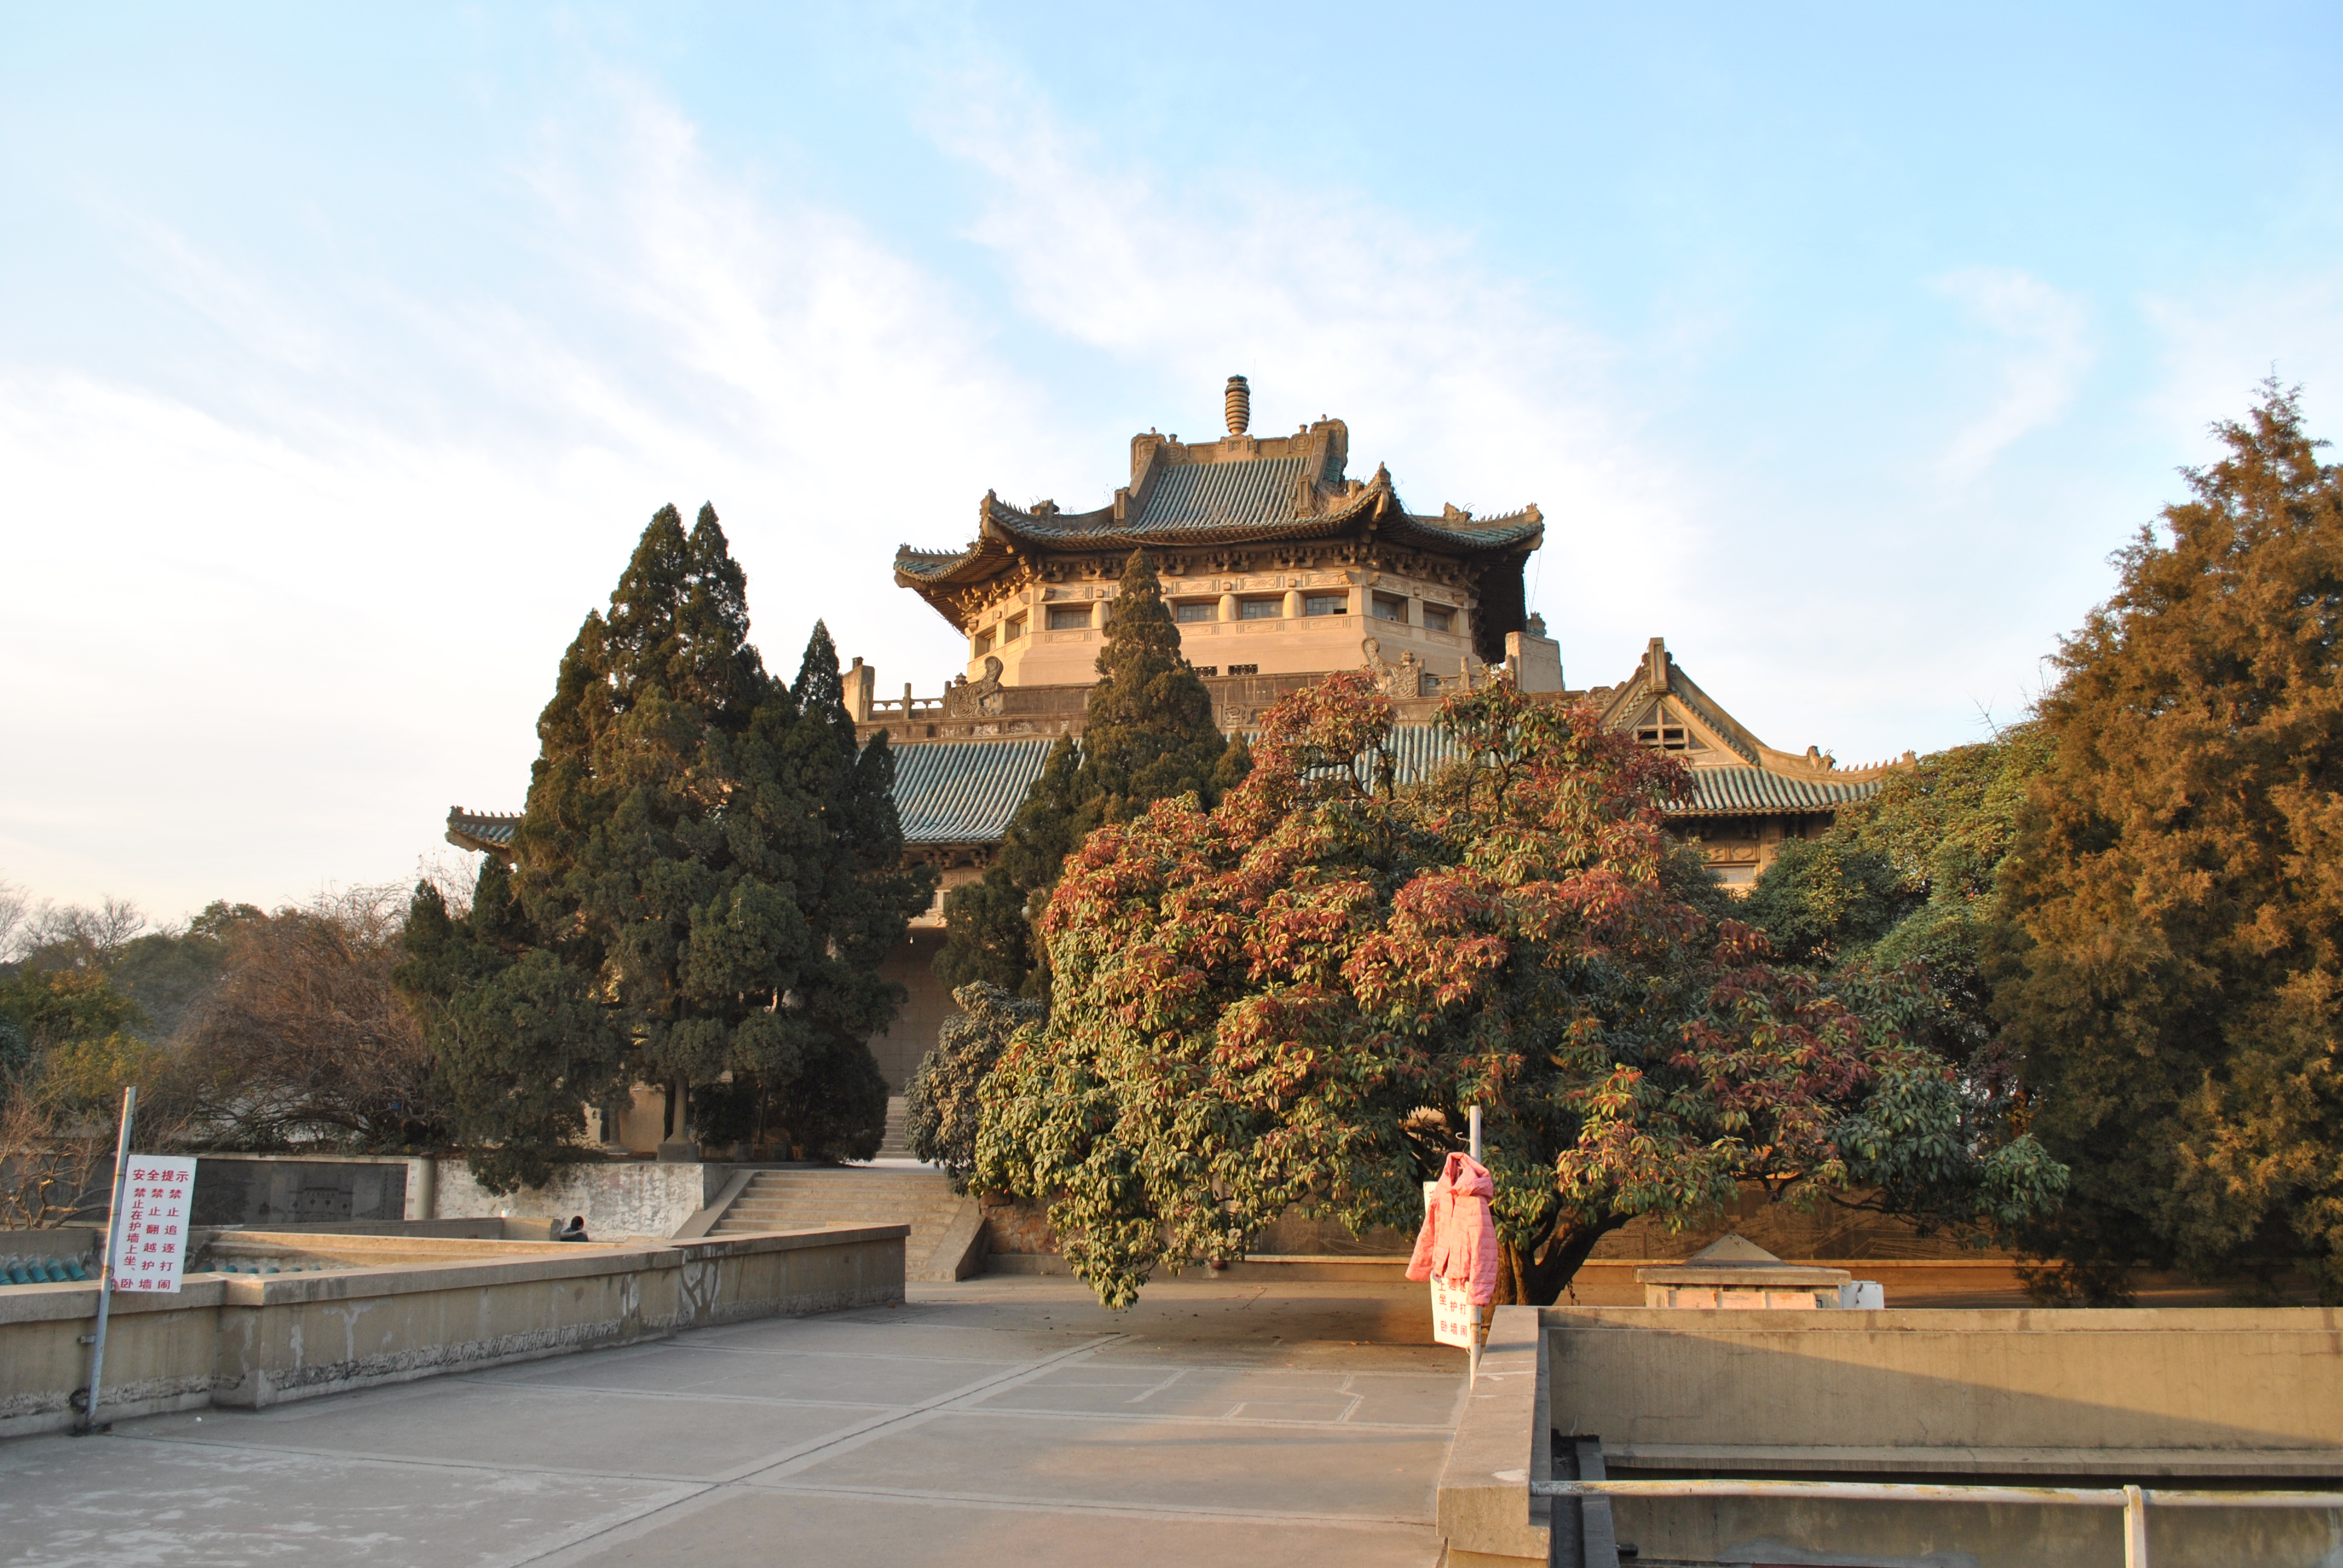 Depiction of Universidad de Wuhan